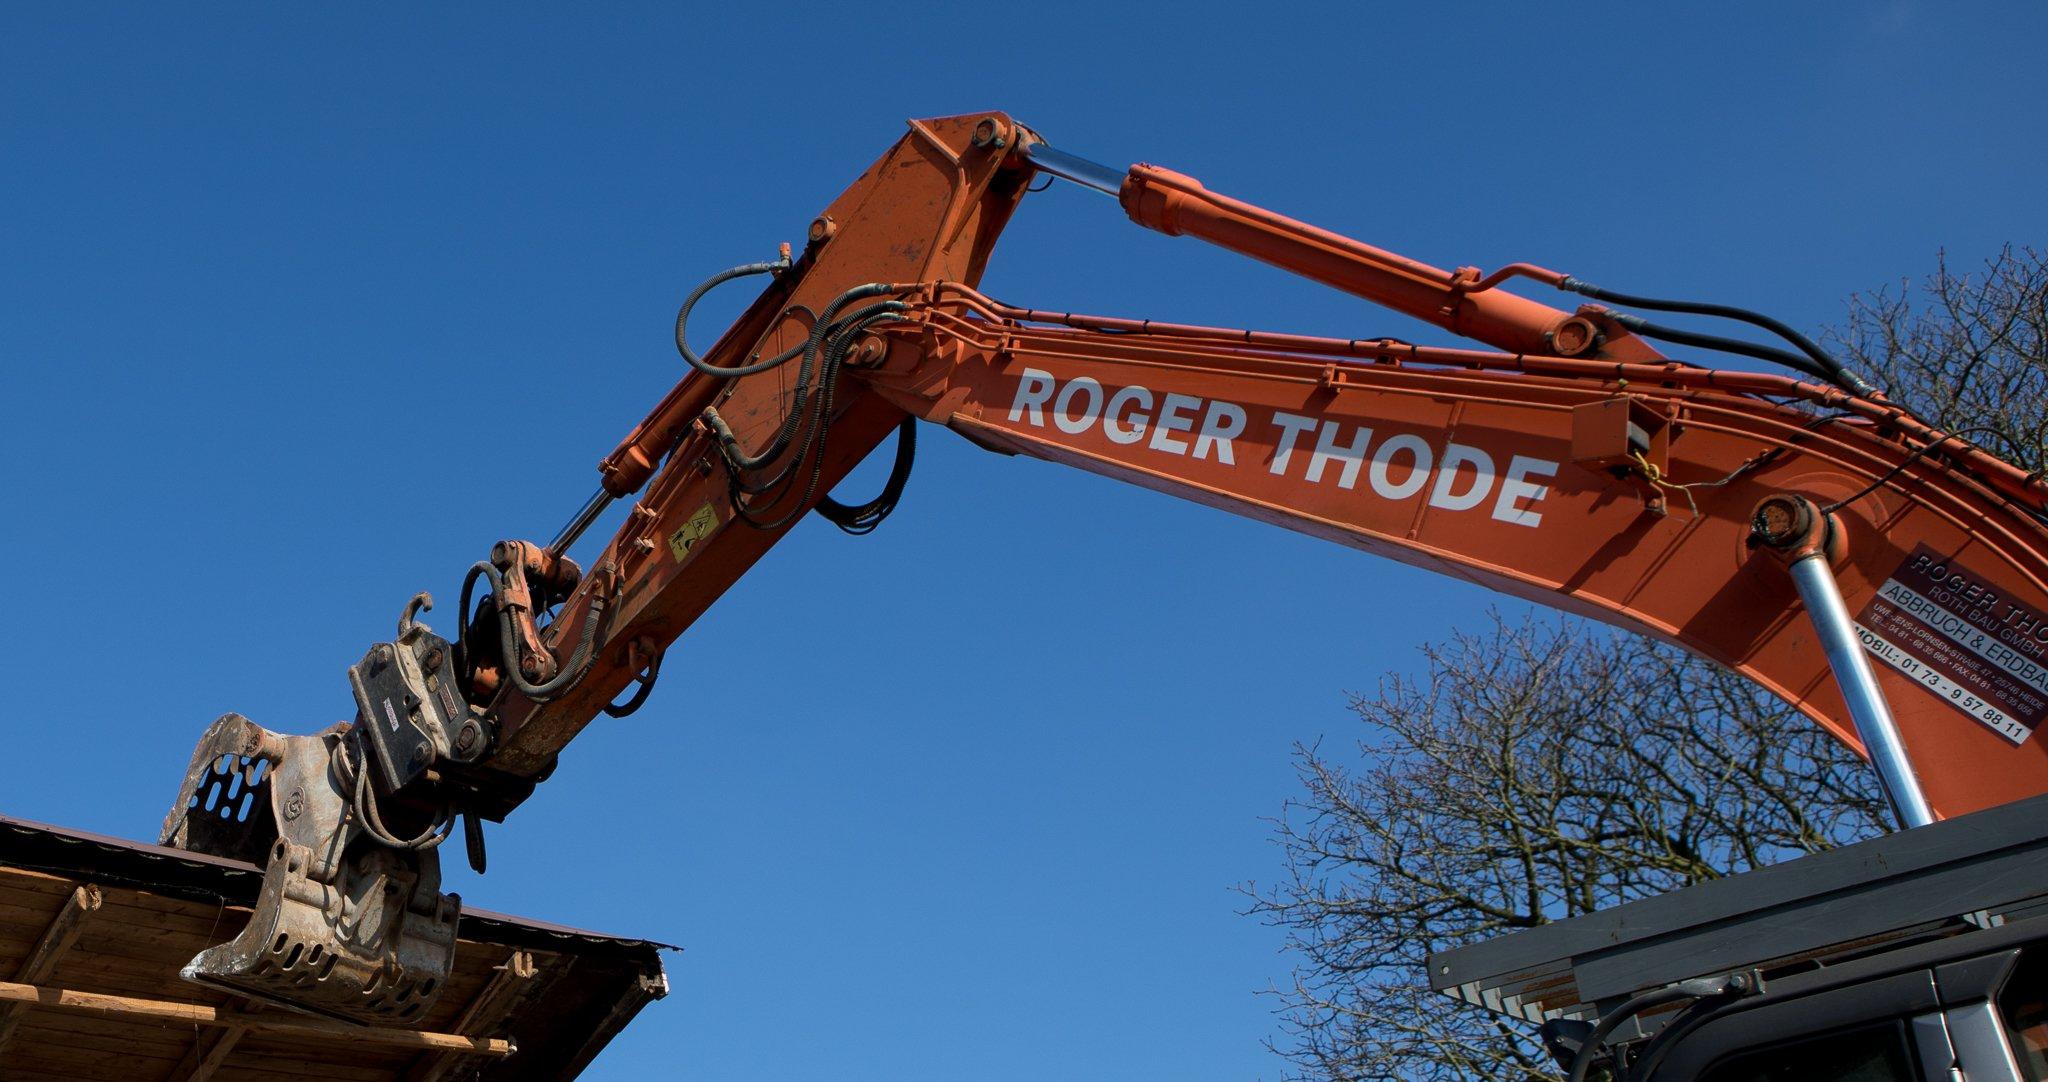 Roth GmbH Roger Thode Heide Abriss und Rückbau